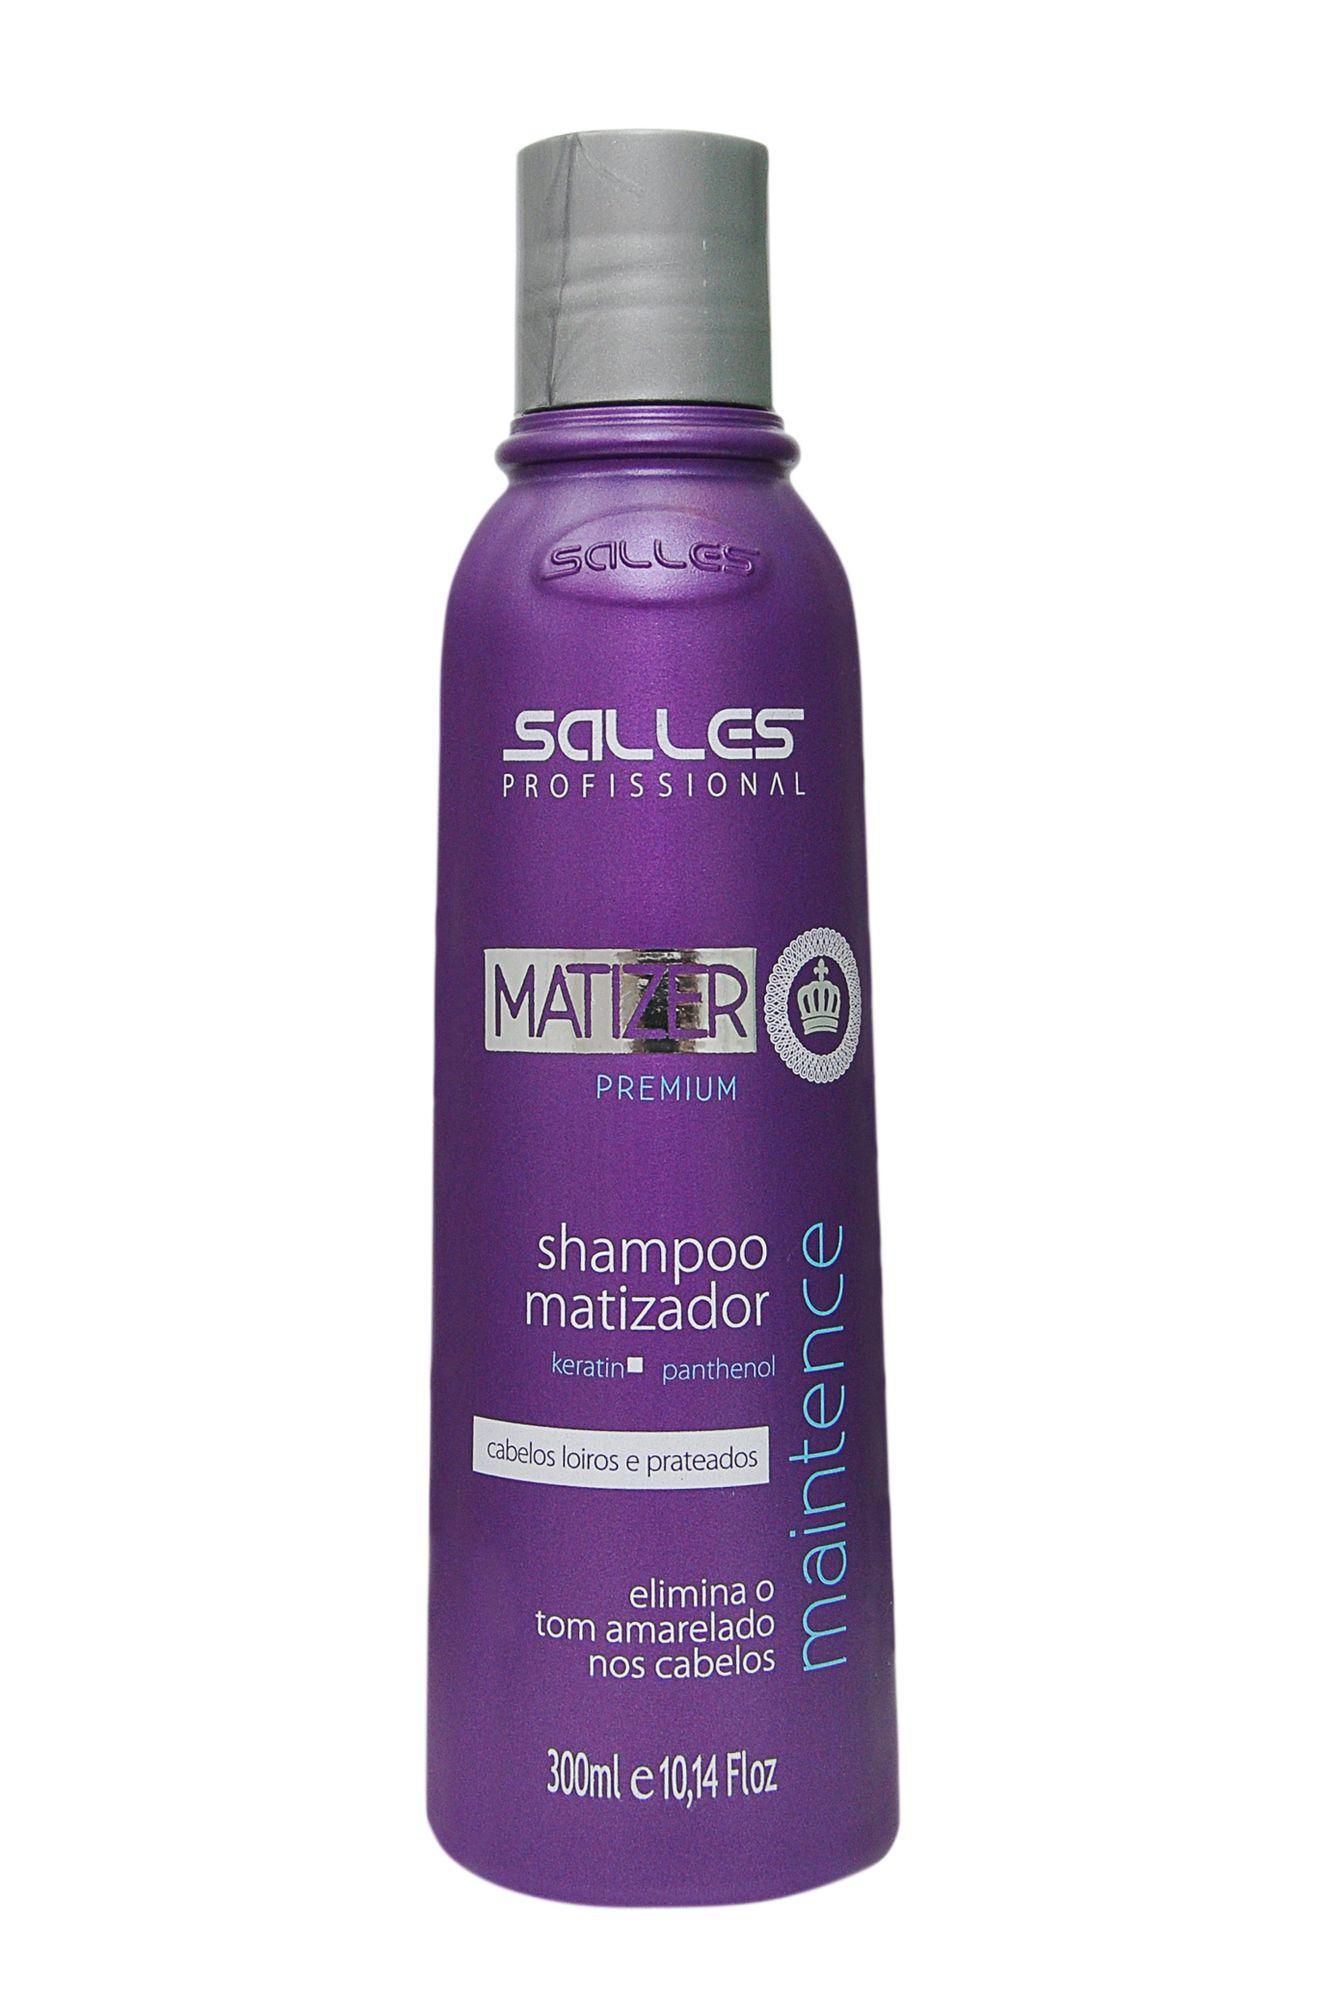 Shampoo Matizer Premium Salles Profissional 300ml